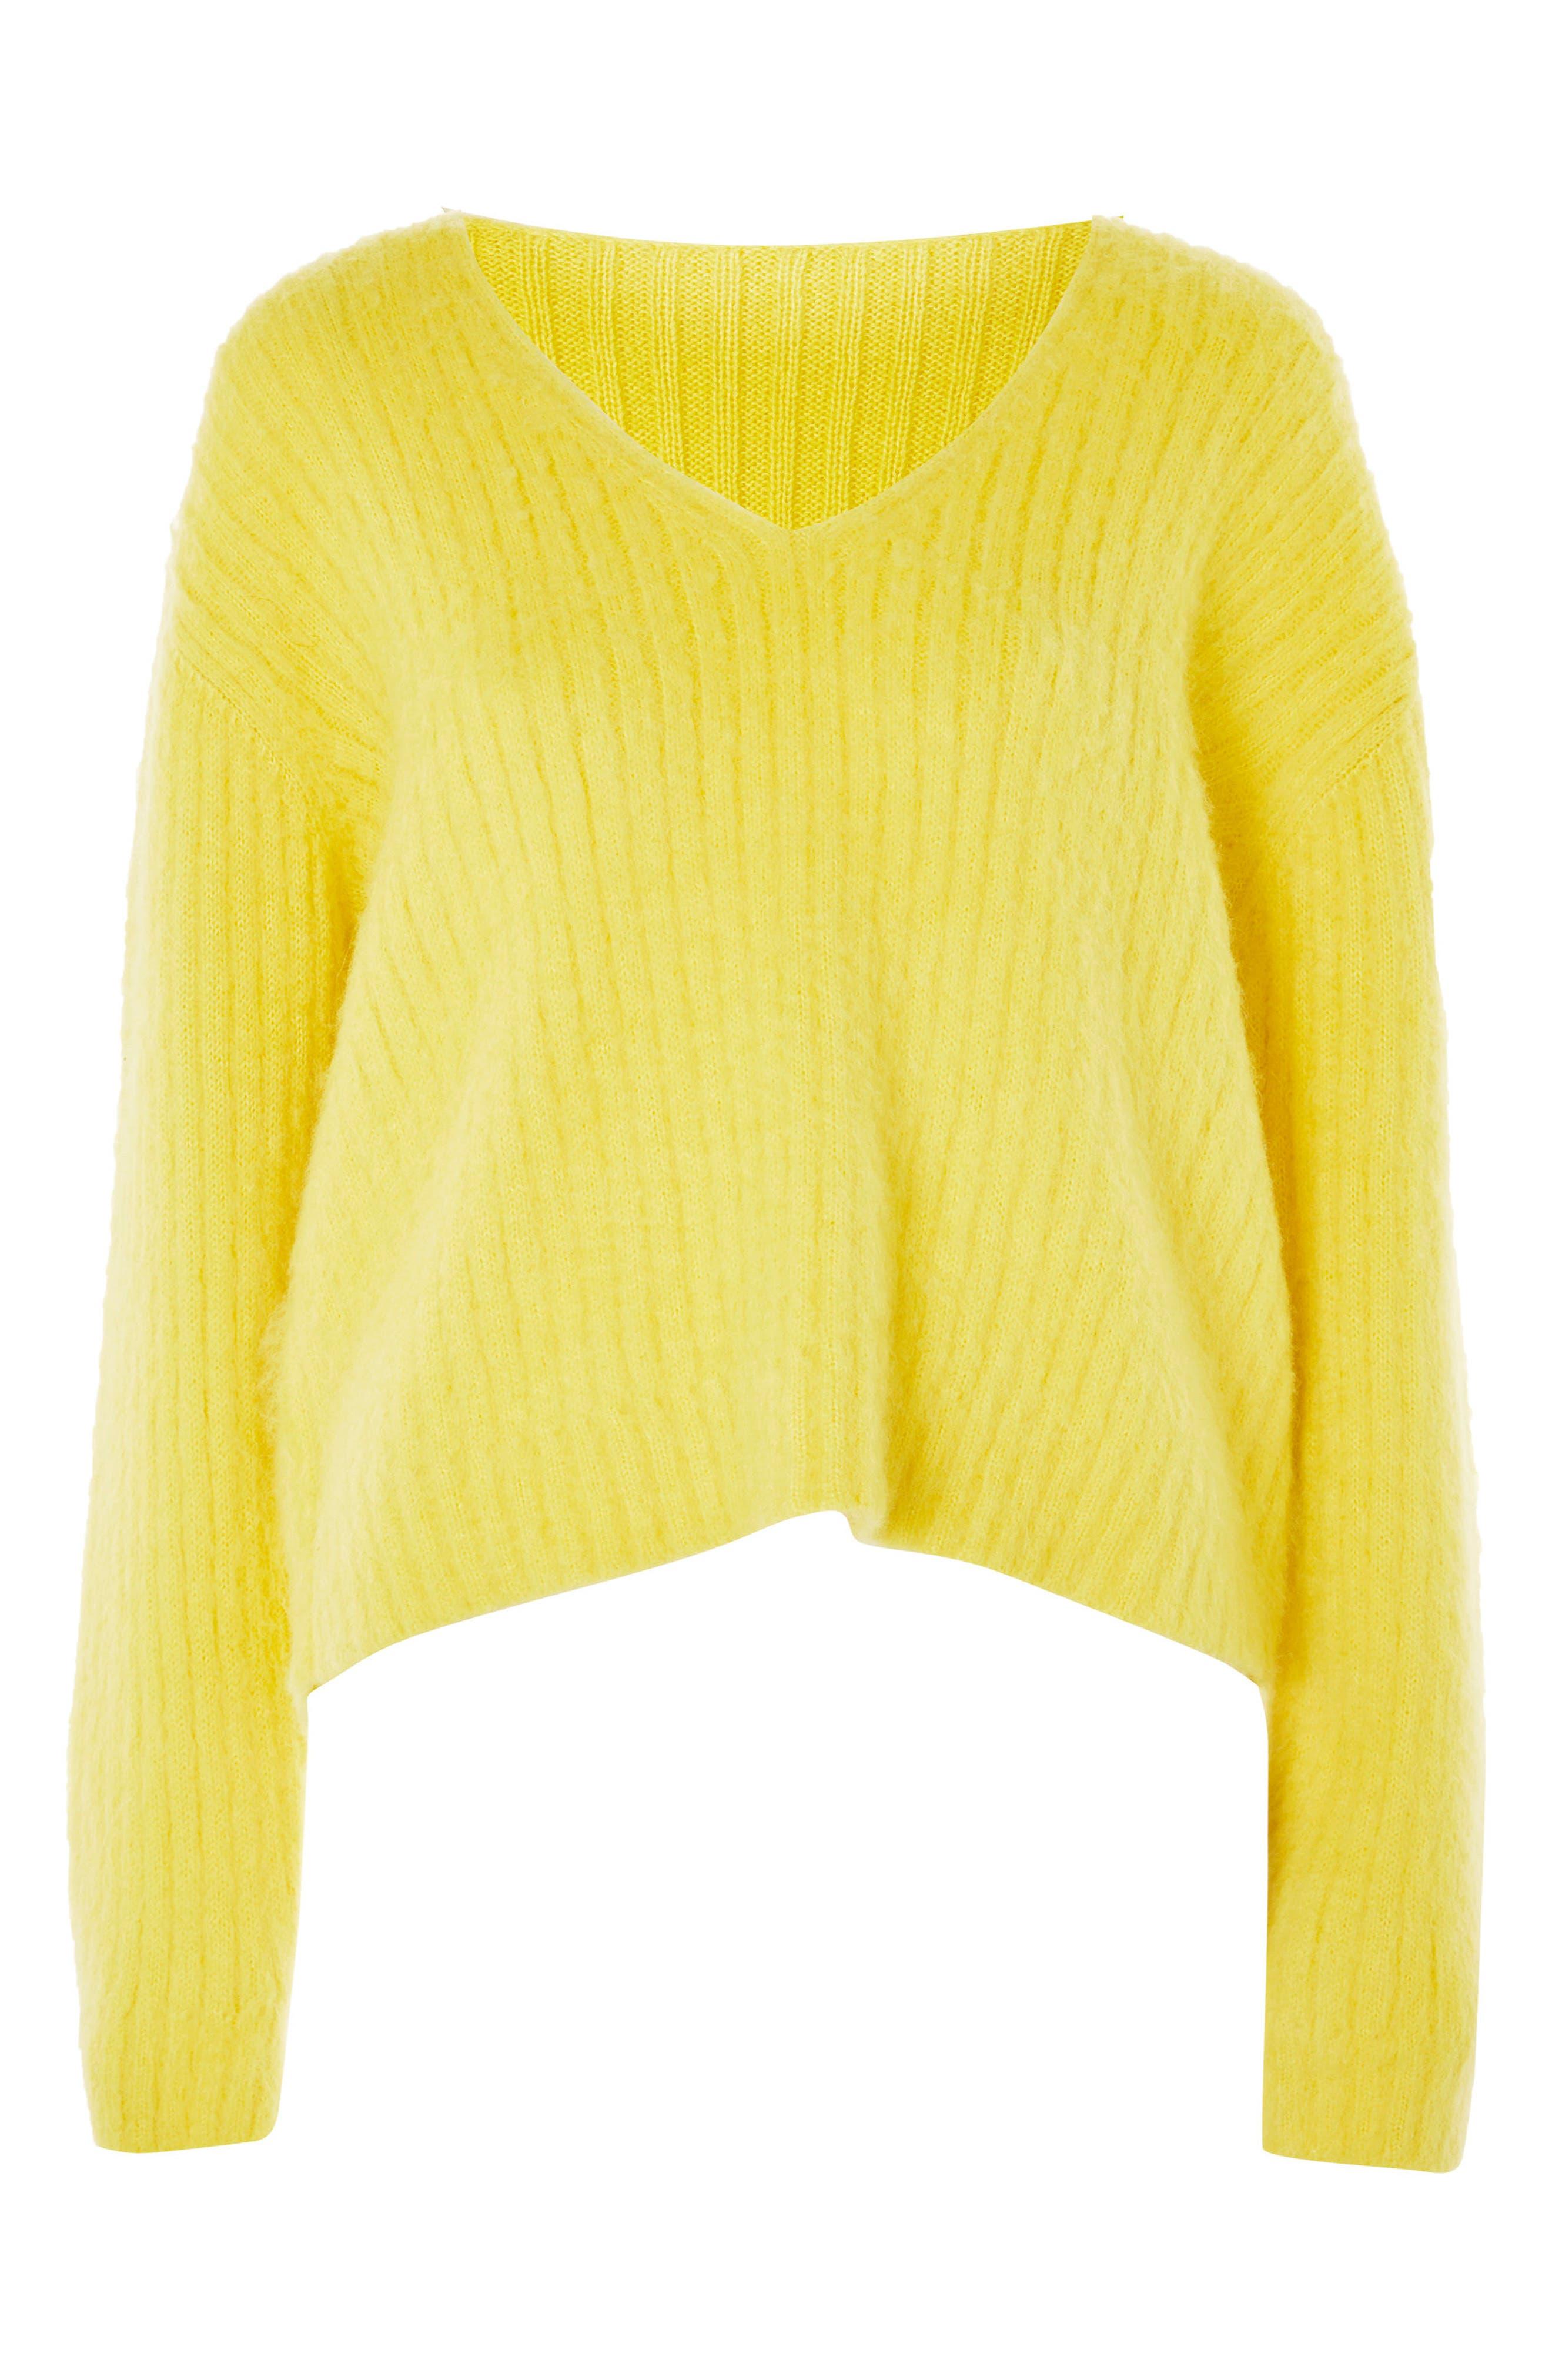 Main Image - Topshop Boutique V-Neck Rib Sweater